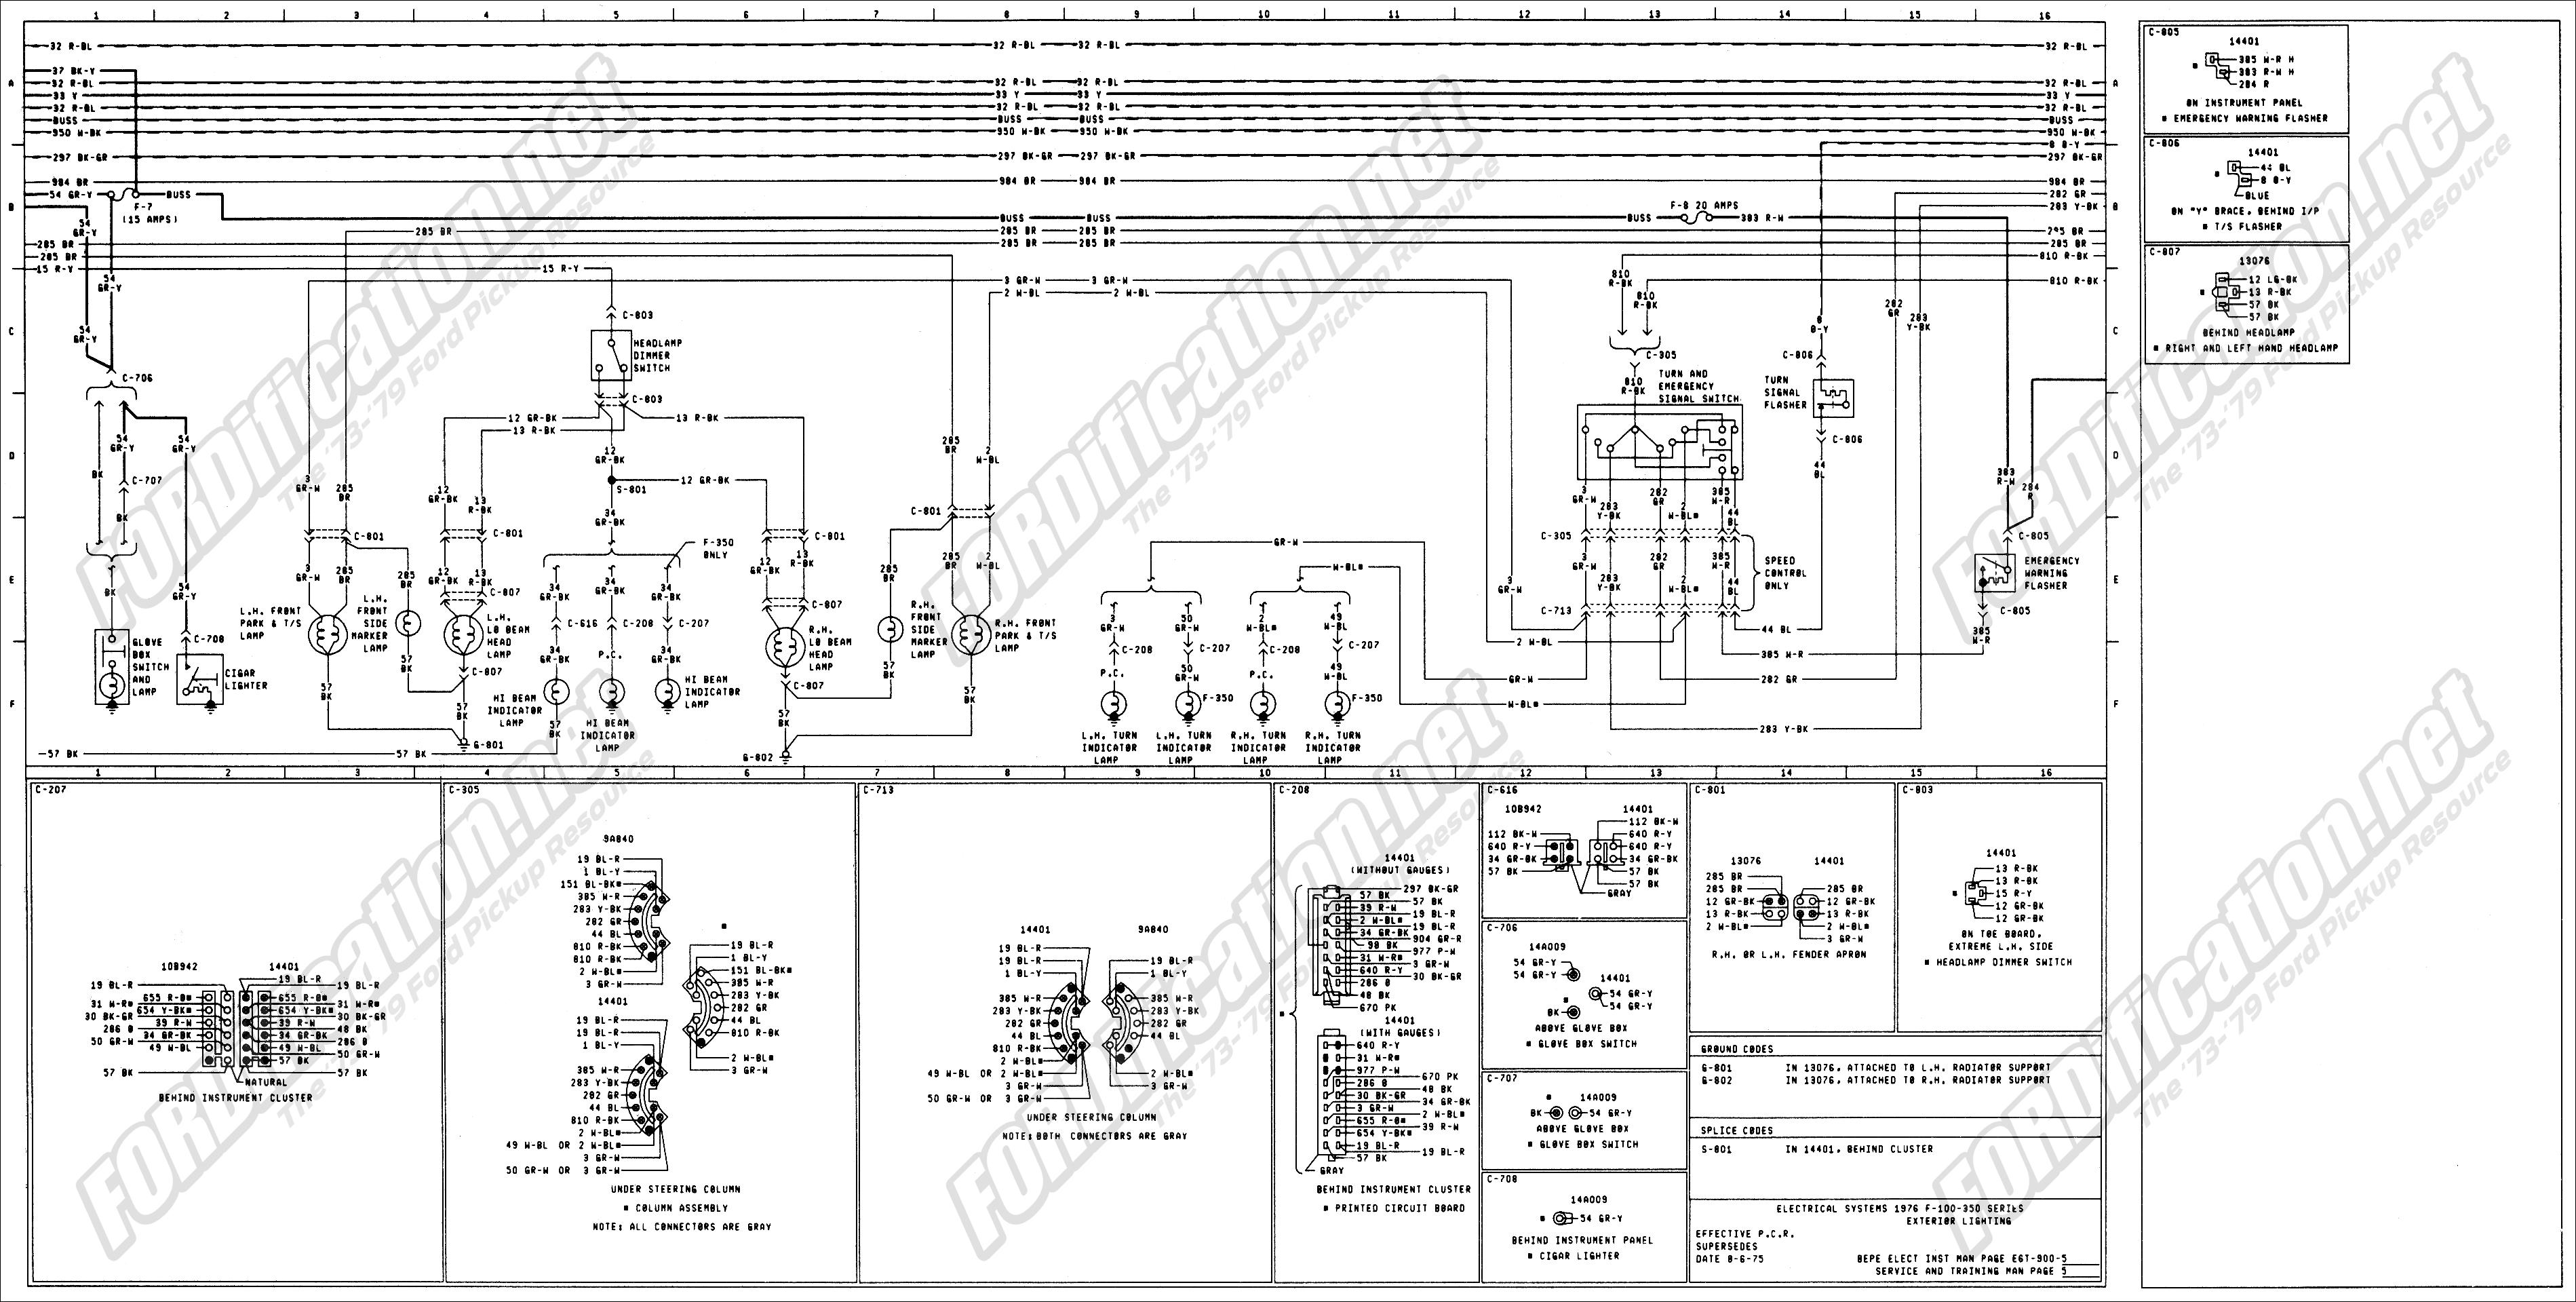 Stupendous 1967 Ford F 250 Wiring Diagram Basic Electronics Wiring Diagram Wiring Cloud Licukshollocom